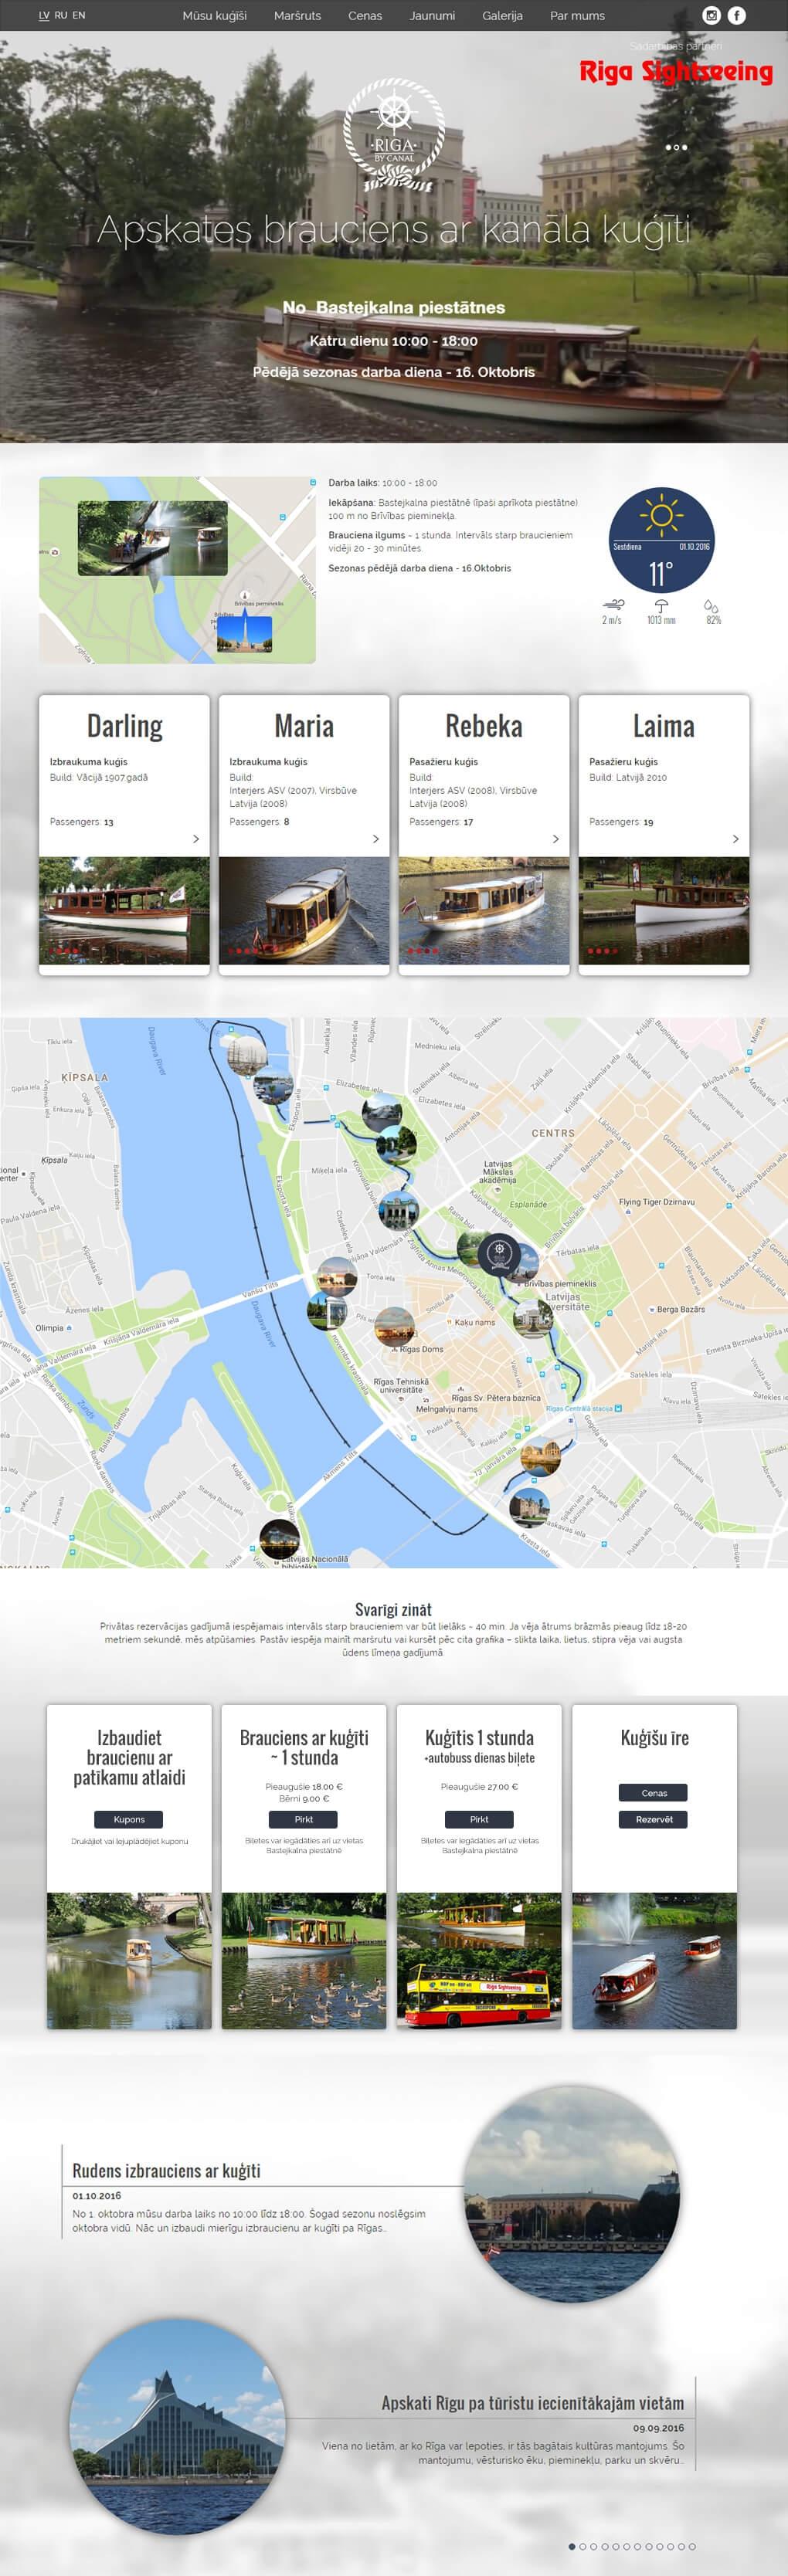 Riga by canal mājas lapa